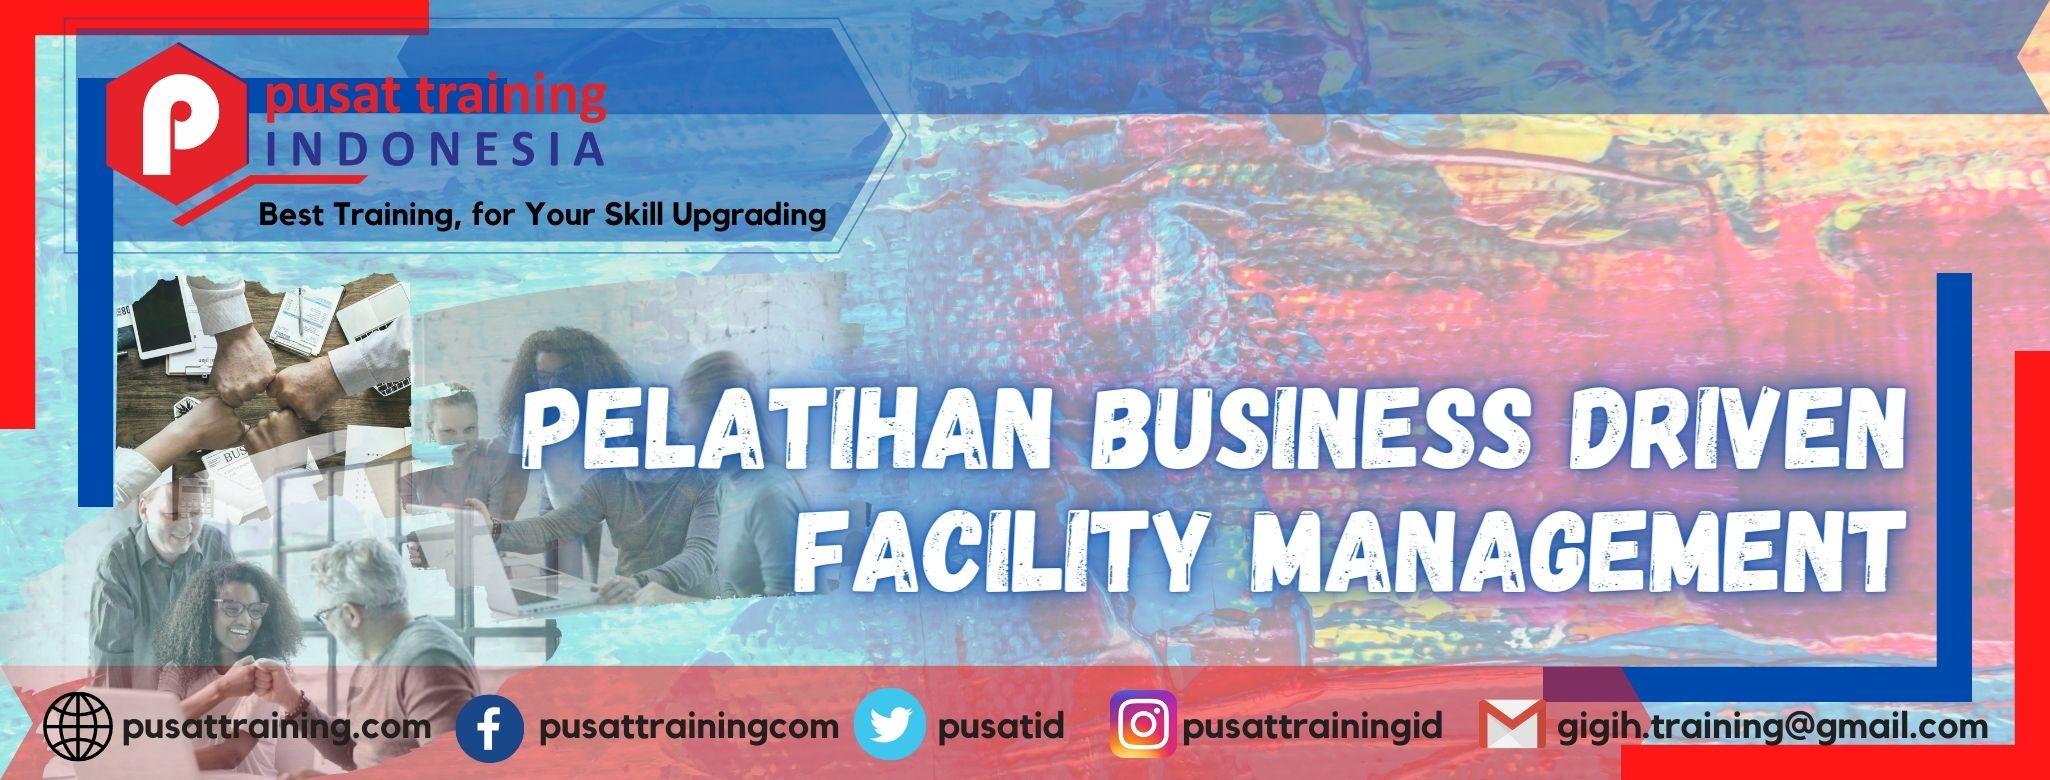 pelatihan-business-driven-facility-management